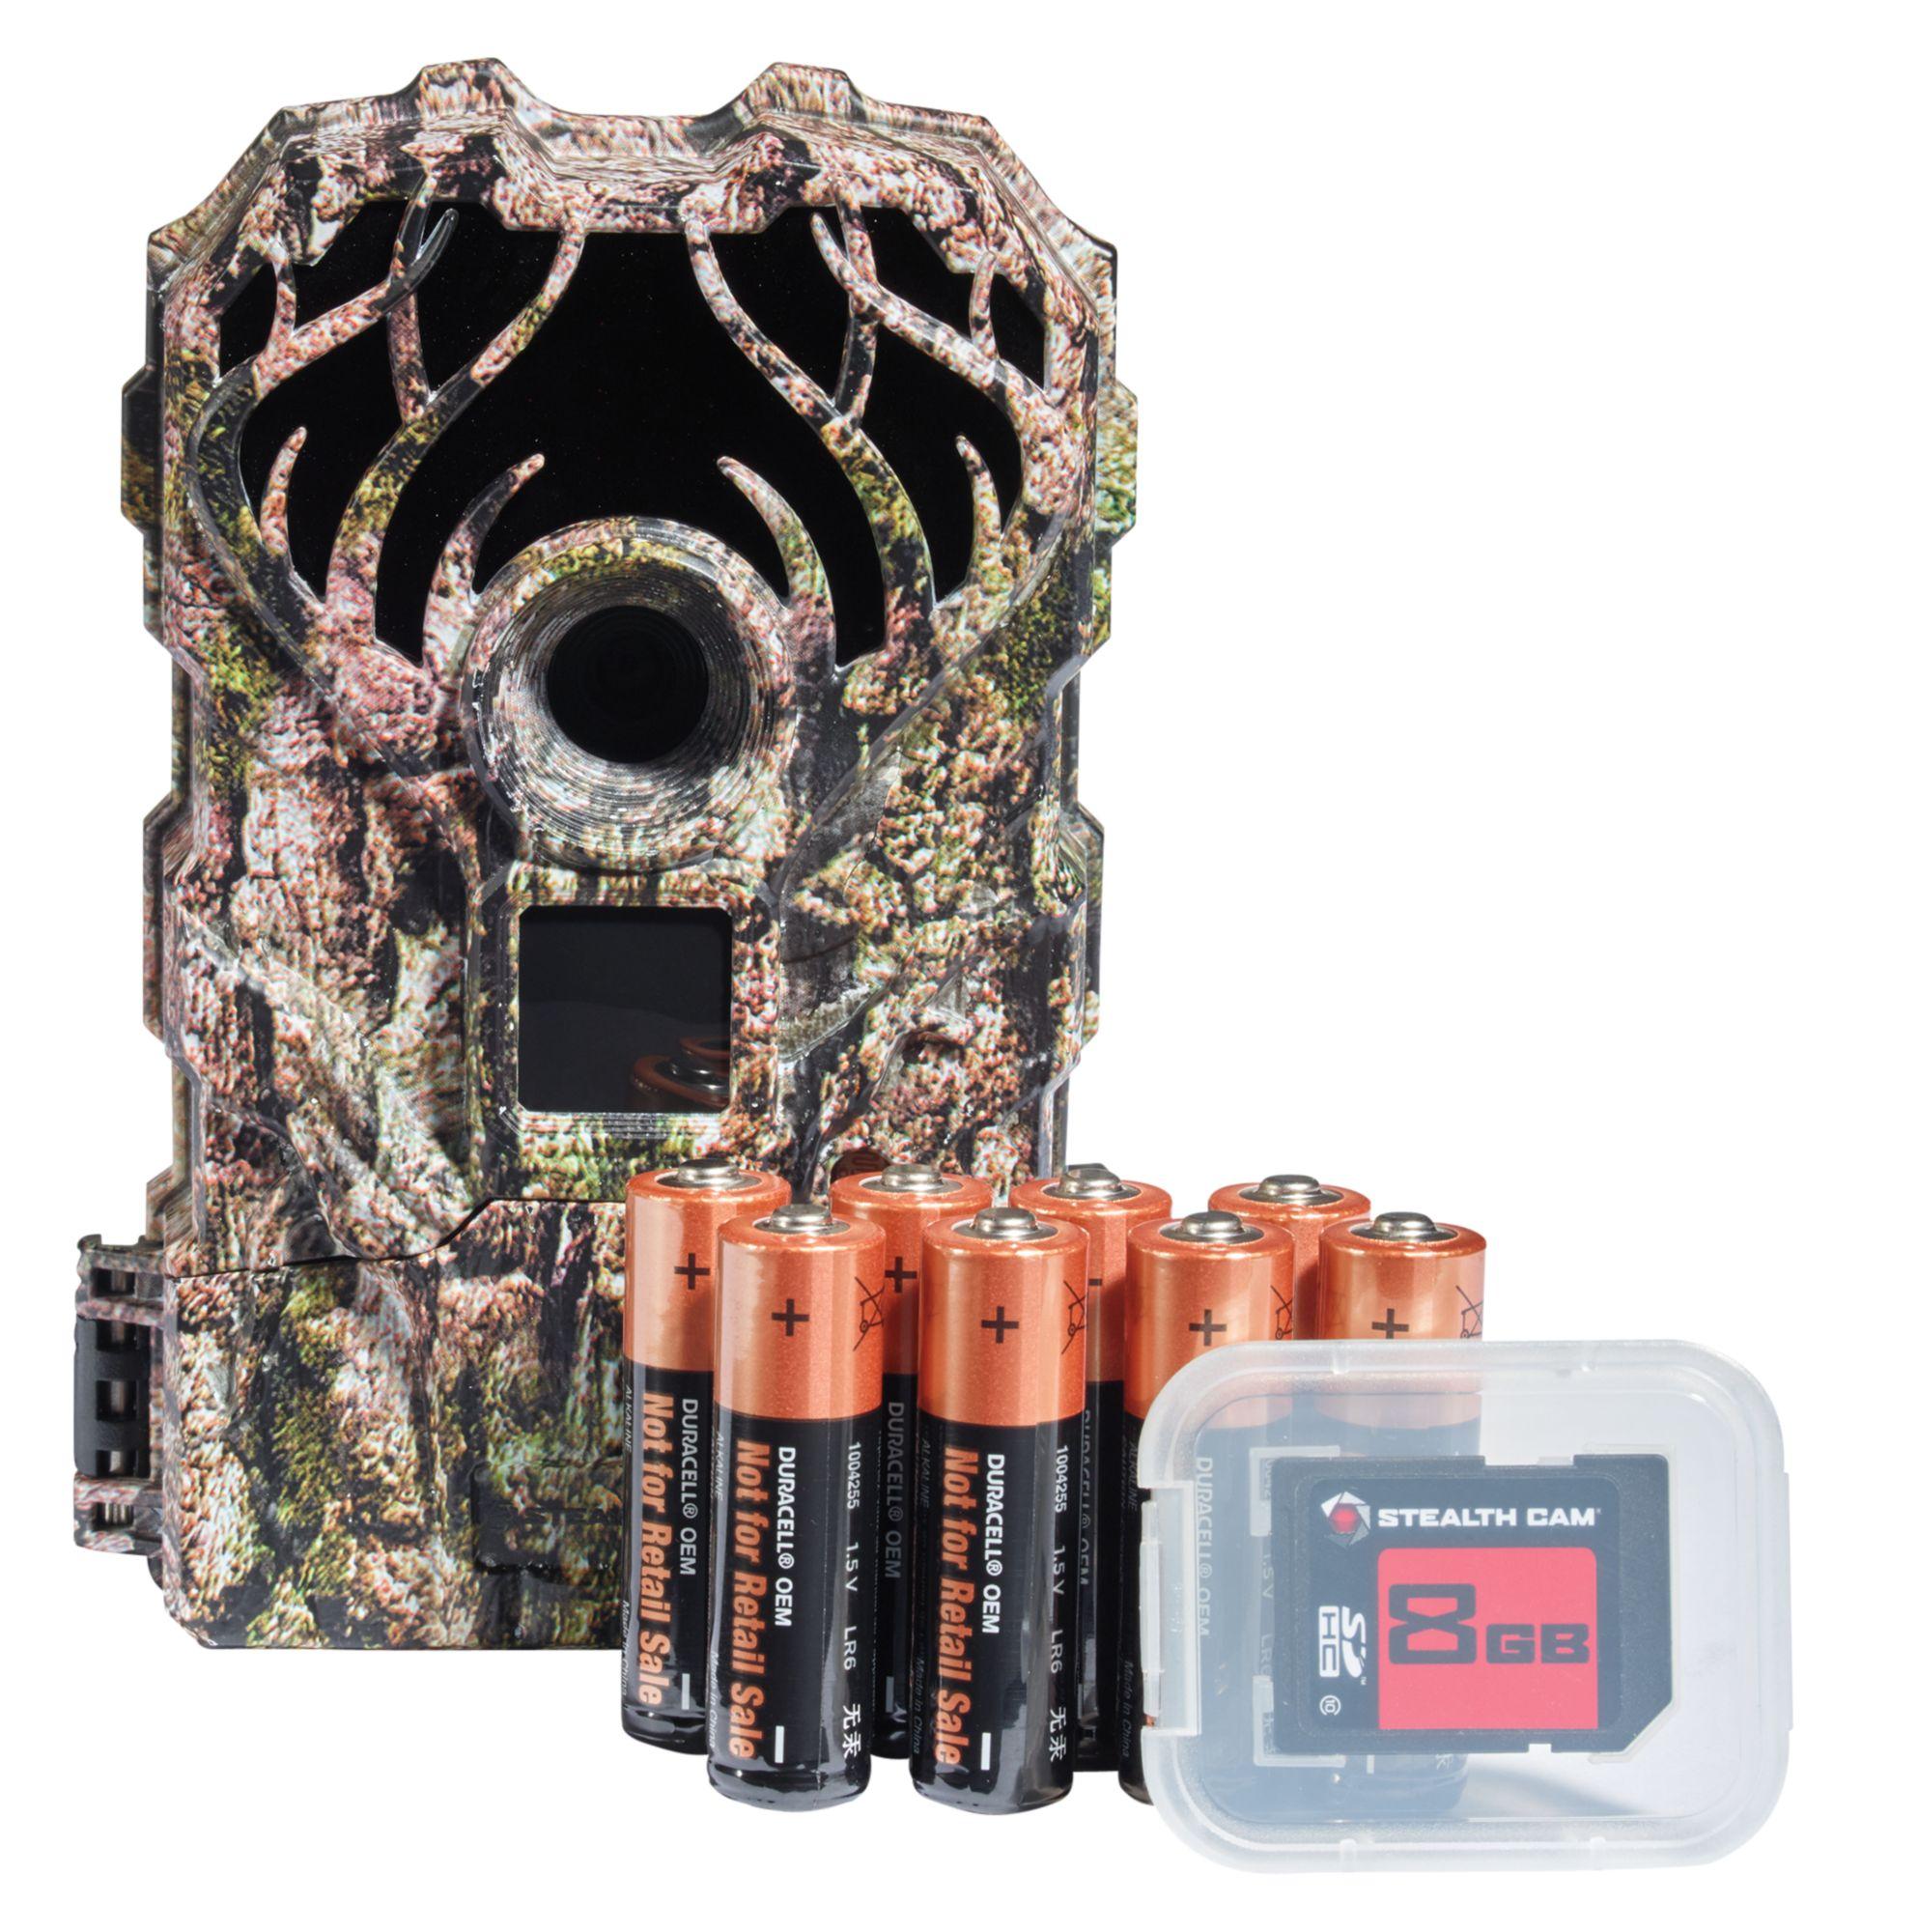 Stealth Cam Droptine Trail Camera – 14MP, camo